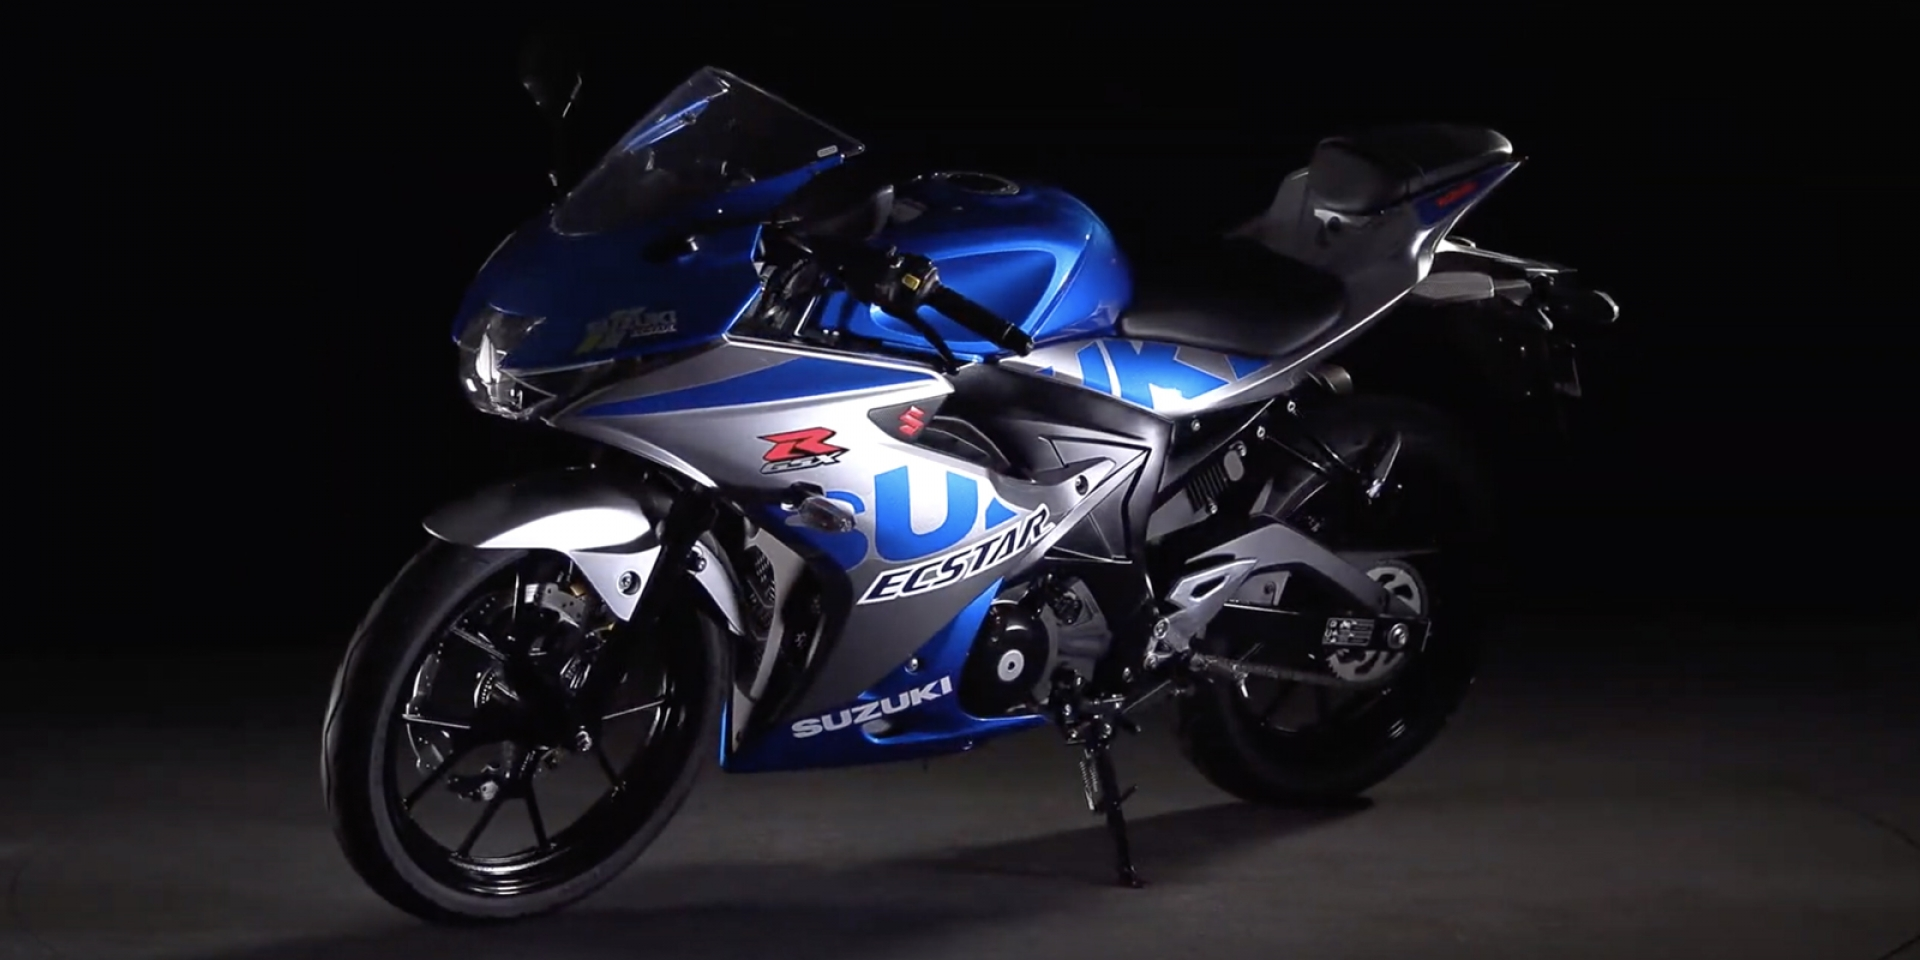 MotoGP新塗裝下放小阿魯!SUZUKI GSX-R 125/1000R GP特殊新色亮相